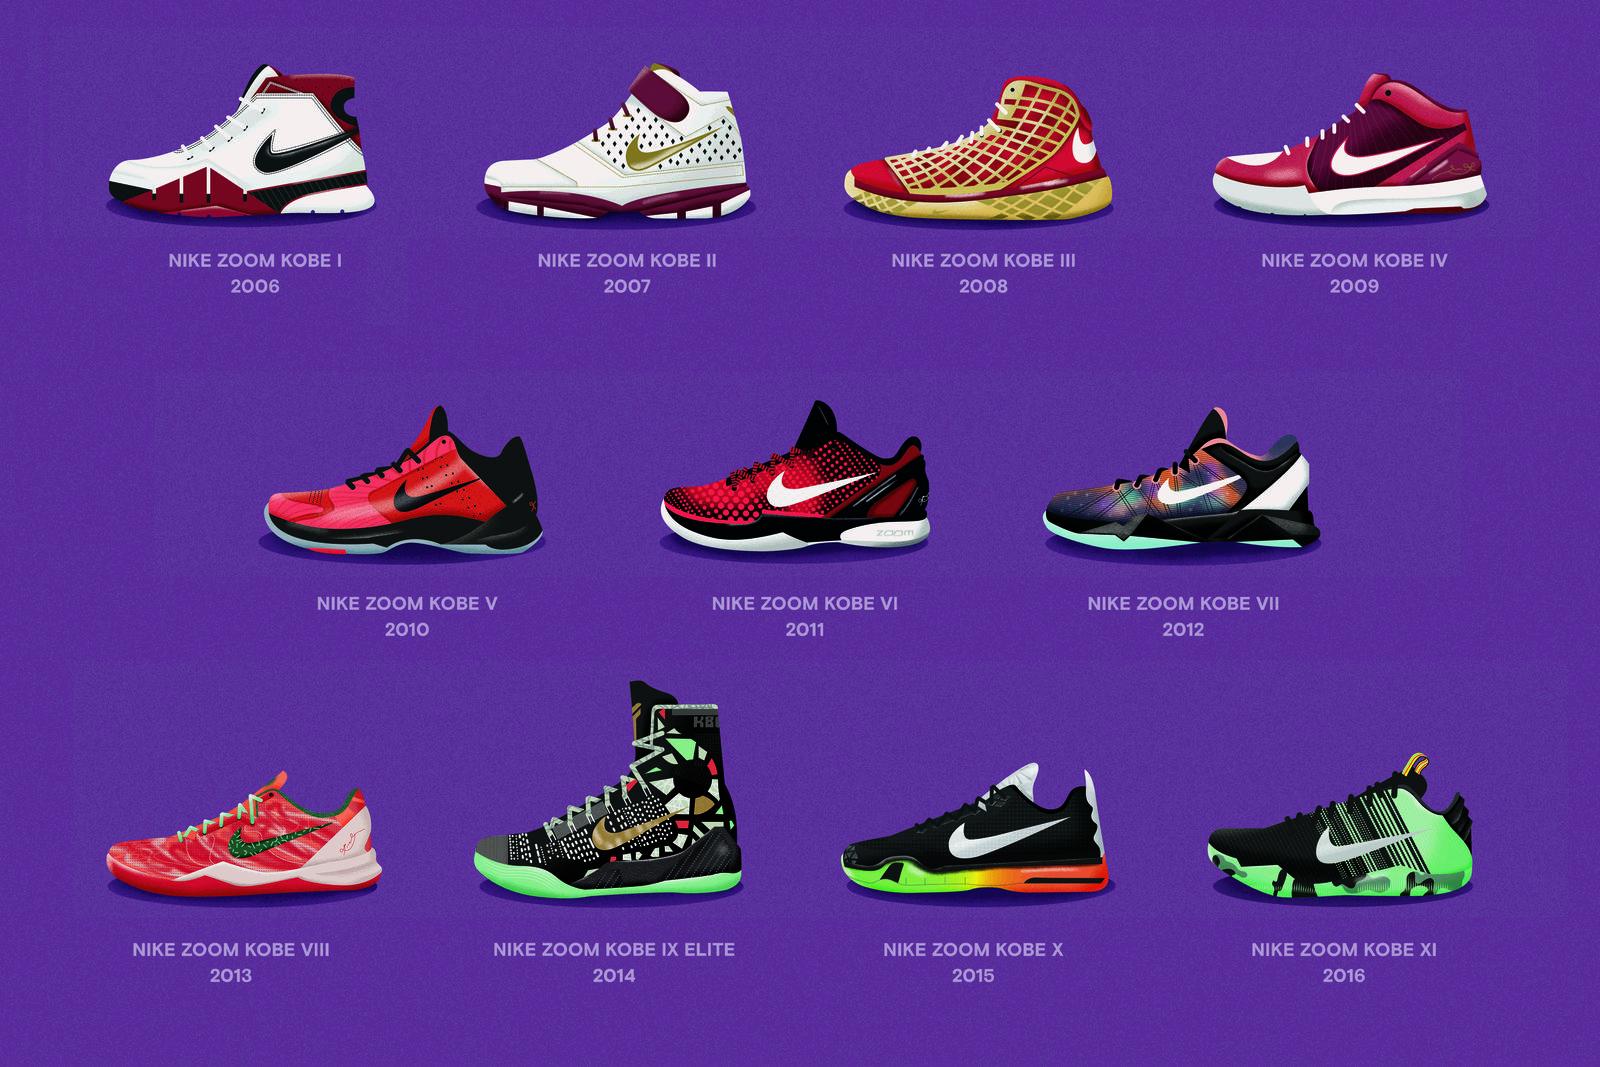 Kobe Bryant Animated Wallpaper Nike Basketball Celebrates The Game S Stars Nike News